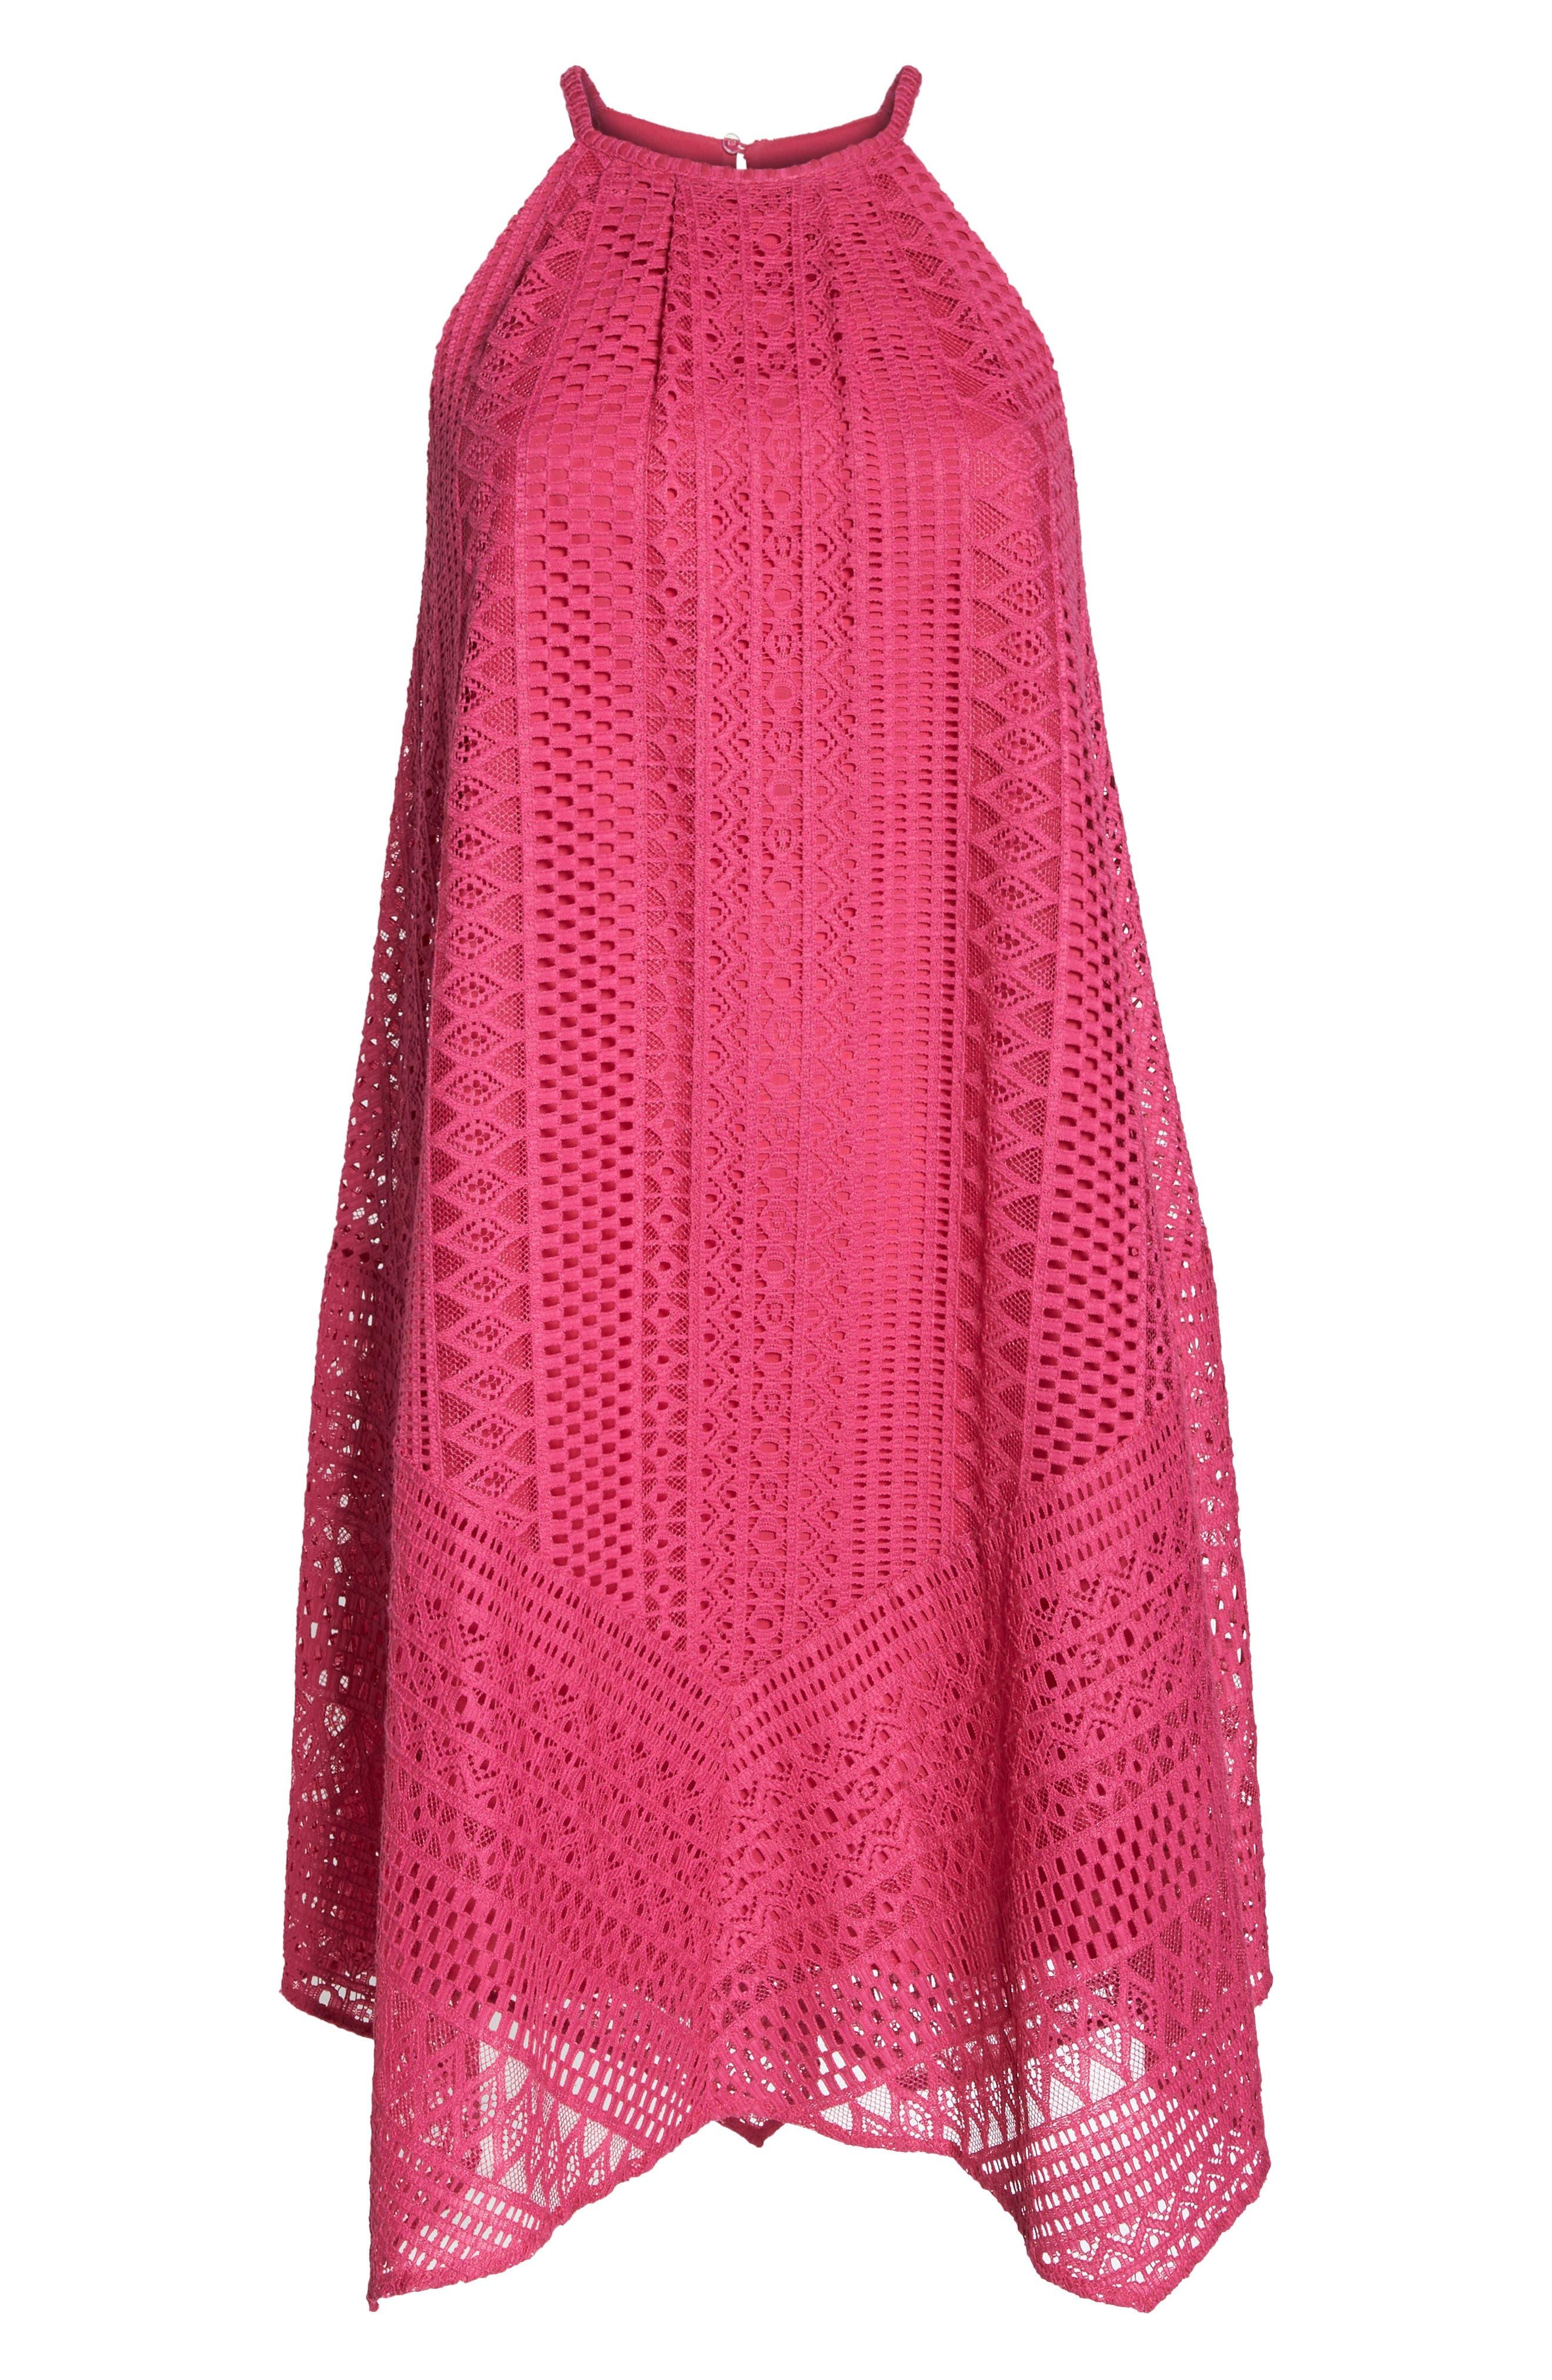 Geo Lace Trapeze Dress,                             Alternate thumbnail 6, color,                             Pink